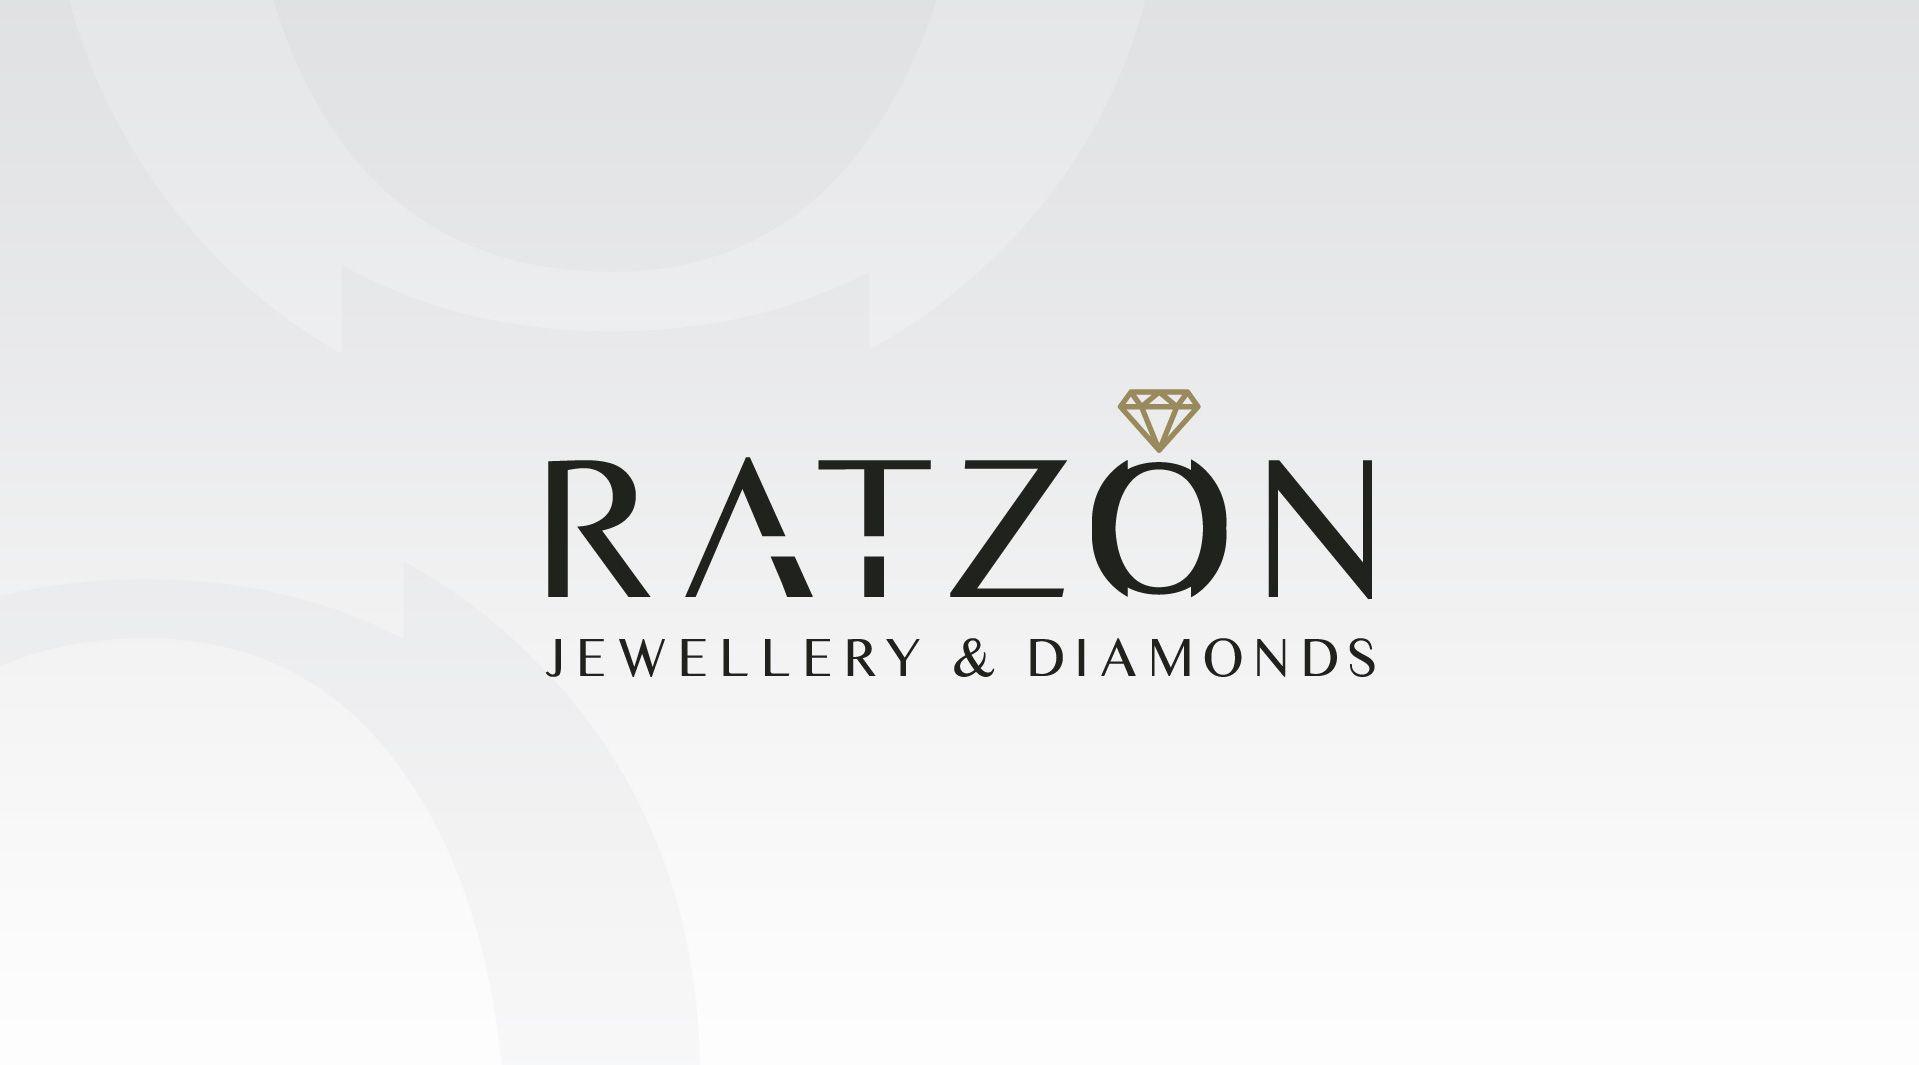 razon_branding1.jpg